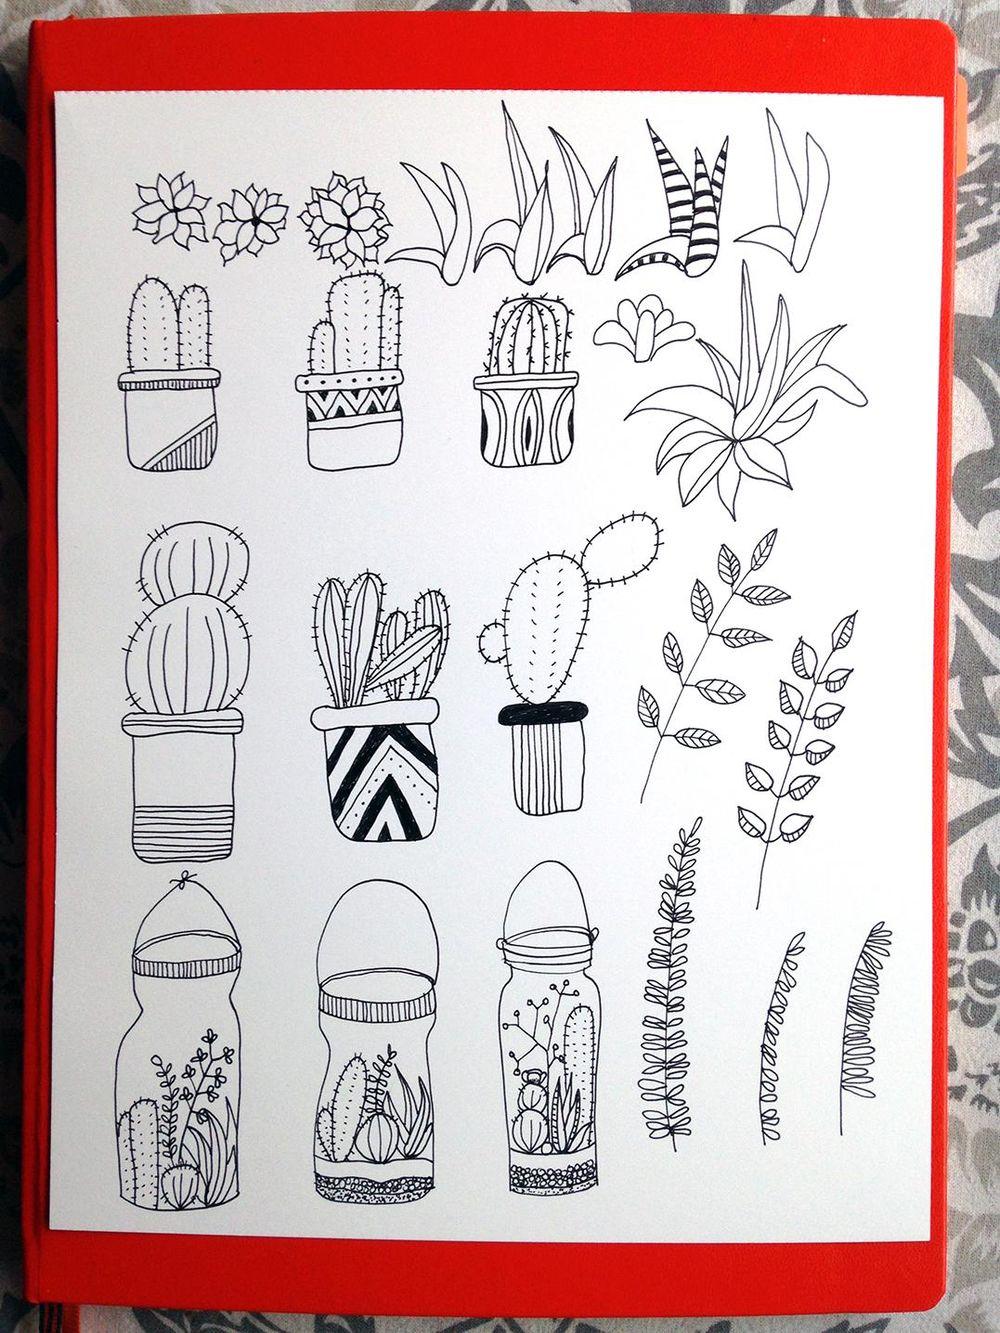 Bullet Journal Botanicals - image 6 - student project